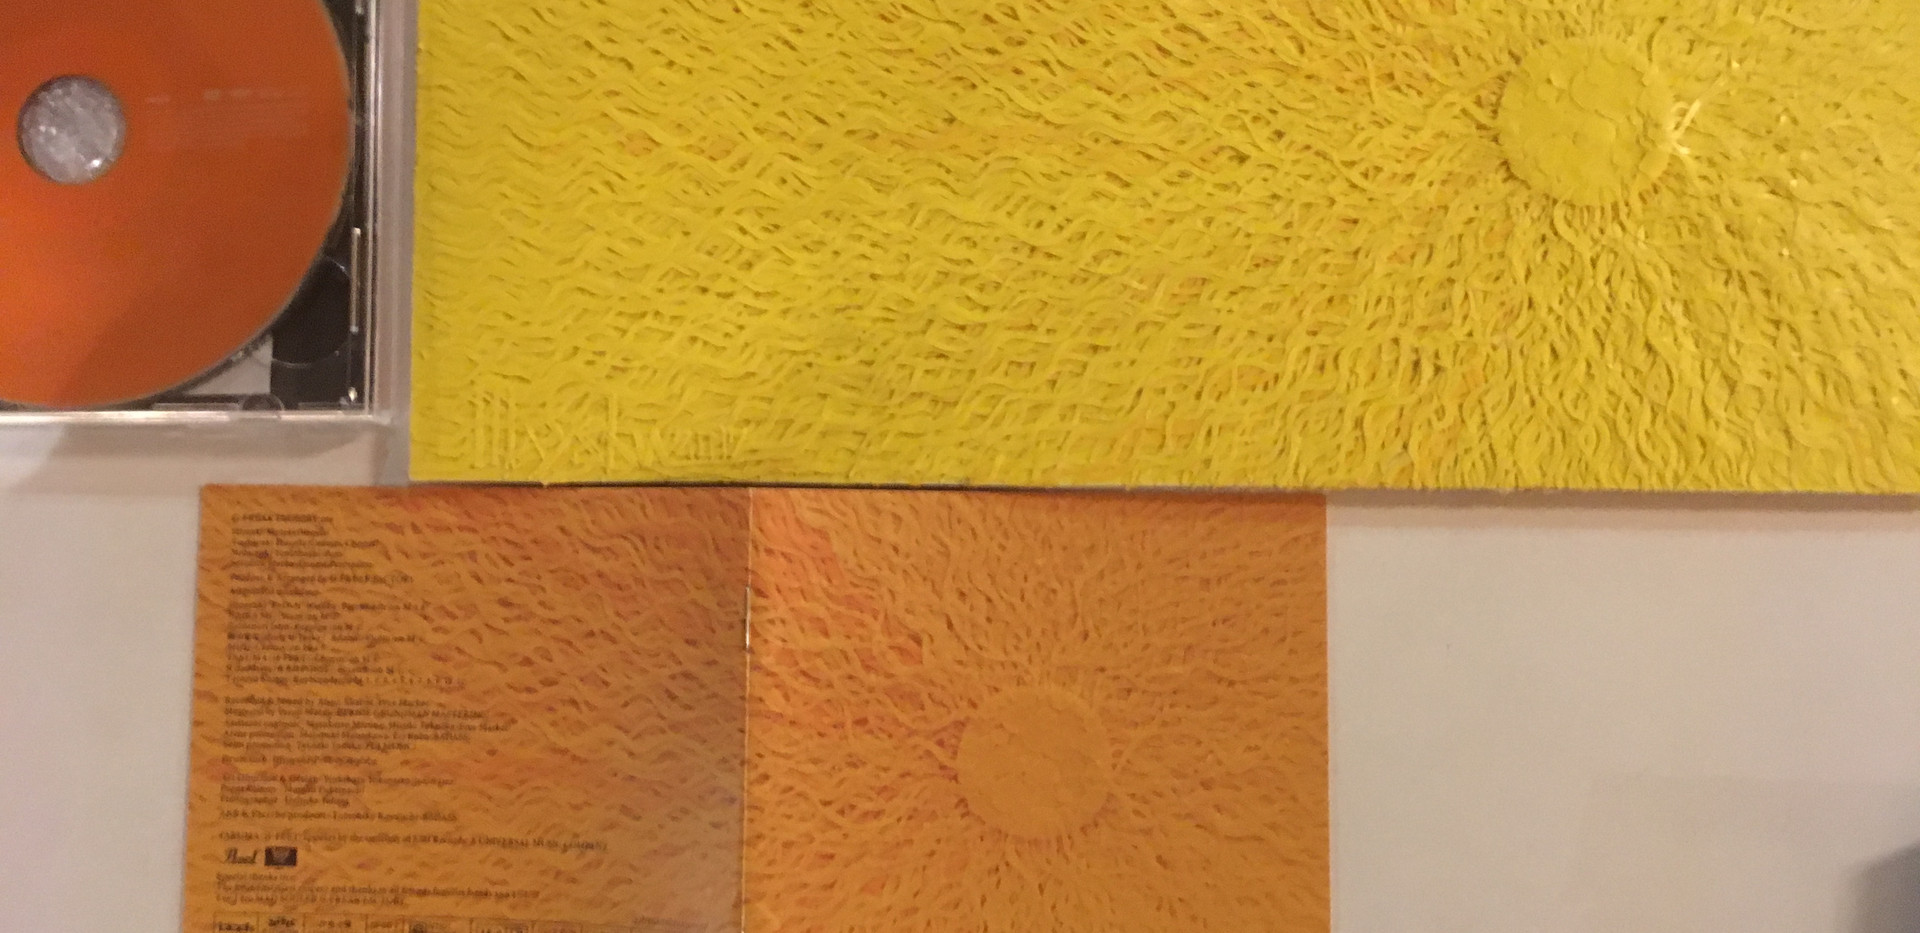 The Yellow Sun 3